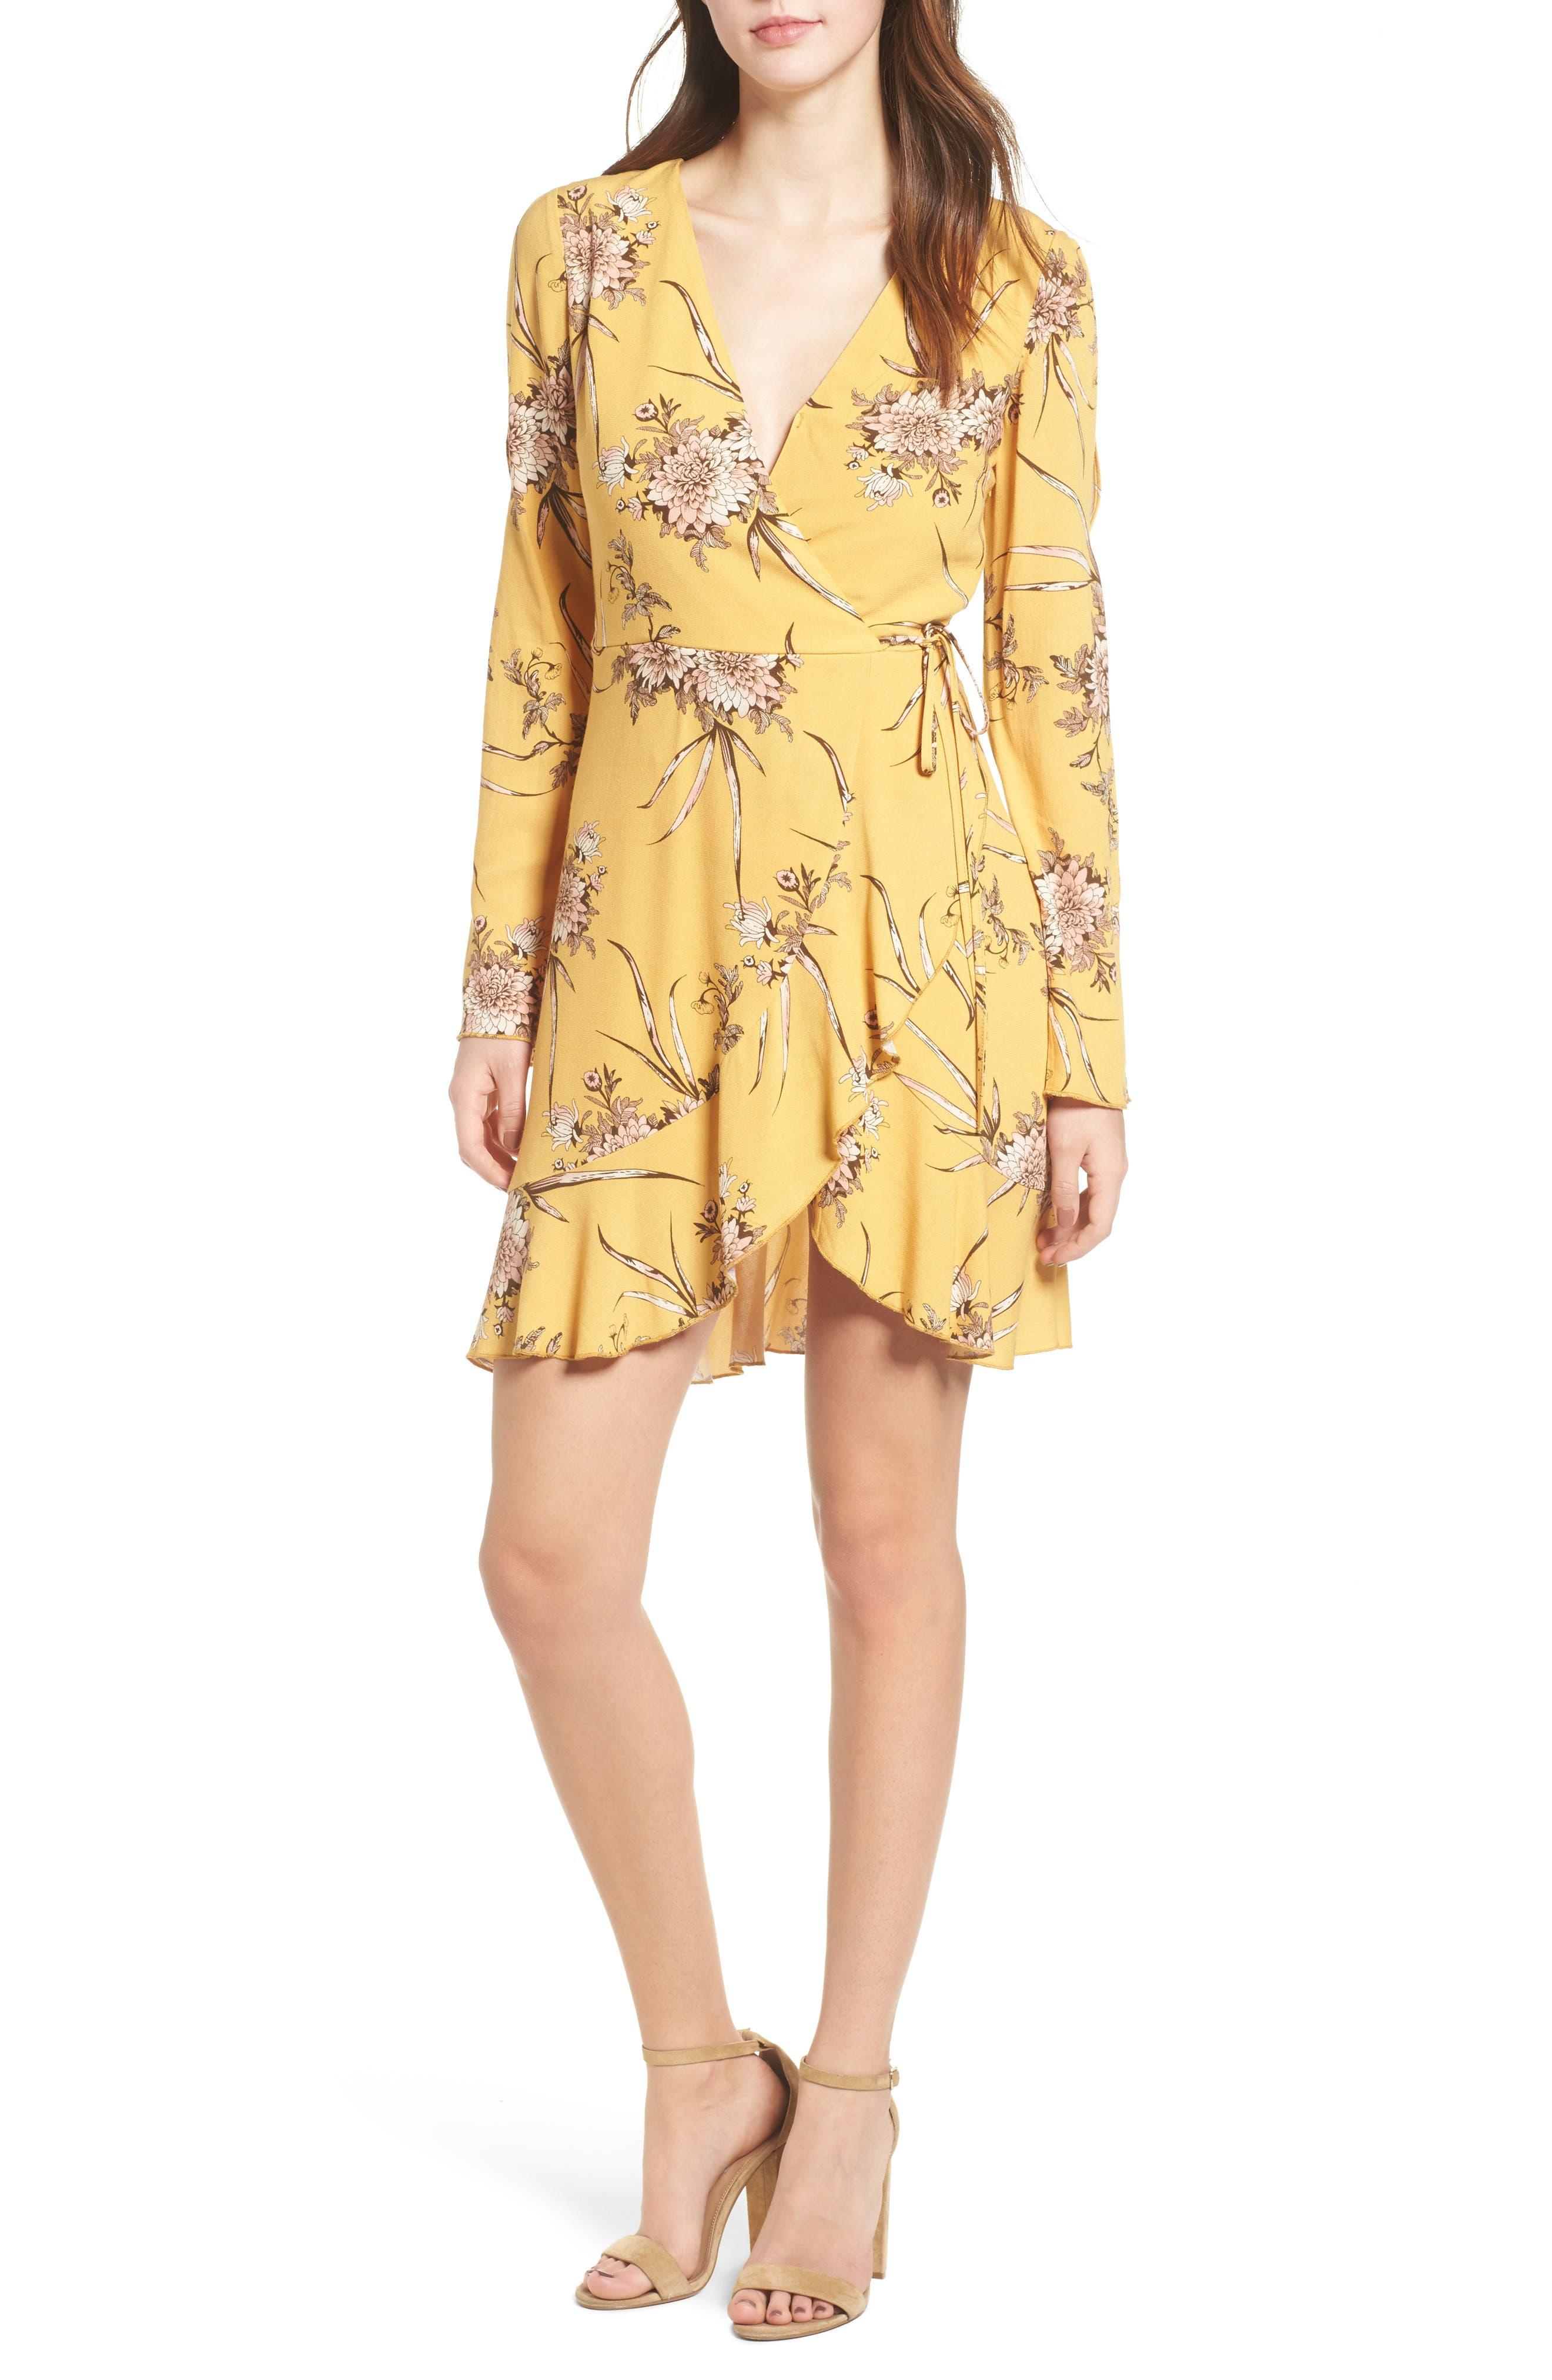 Lira Clothing Marrow Wrap Dress